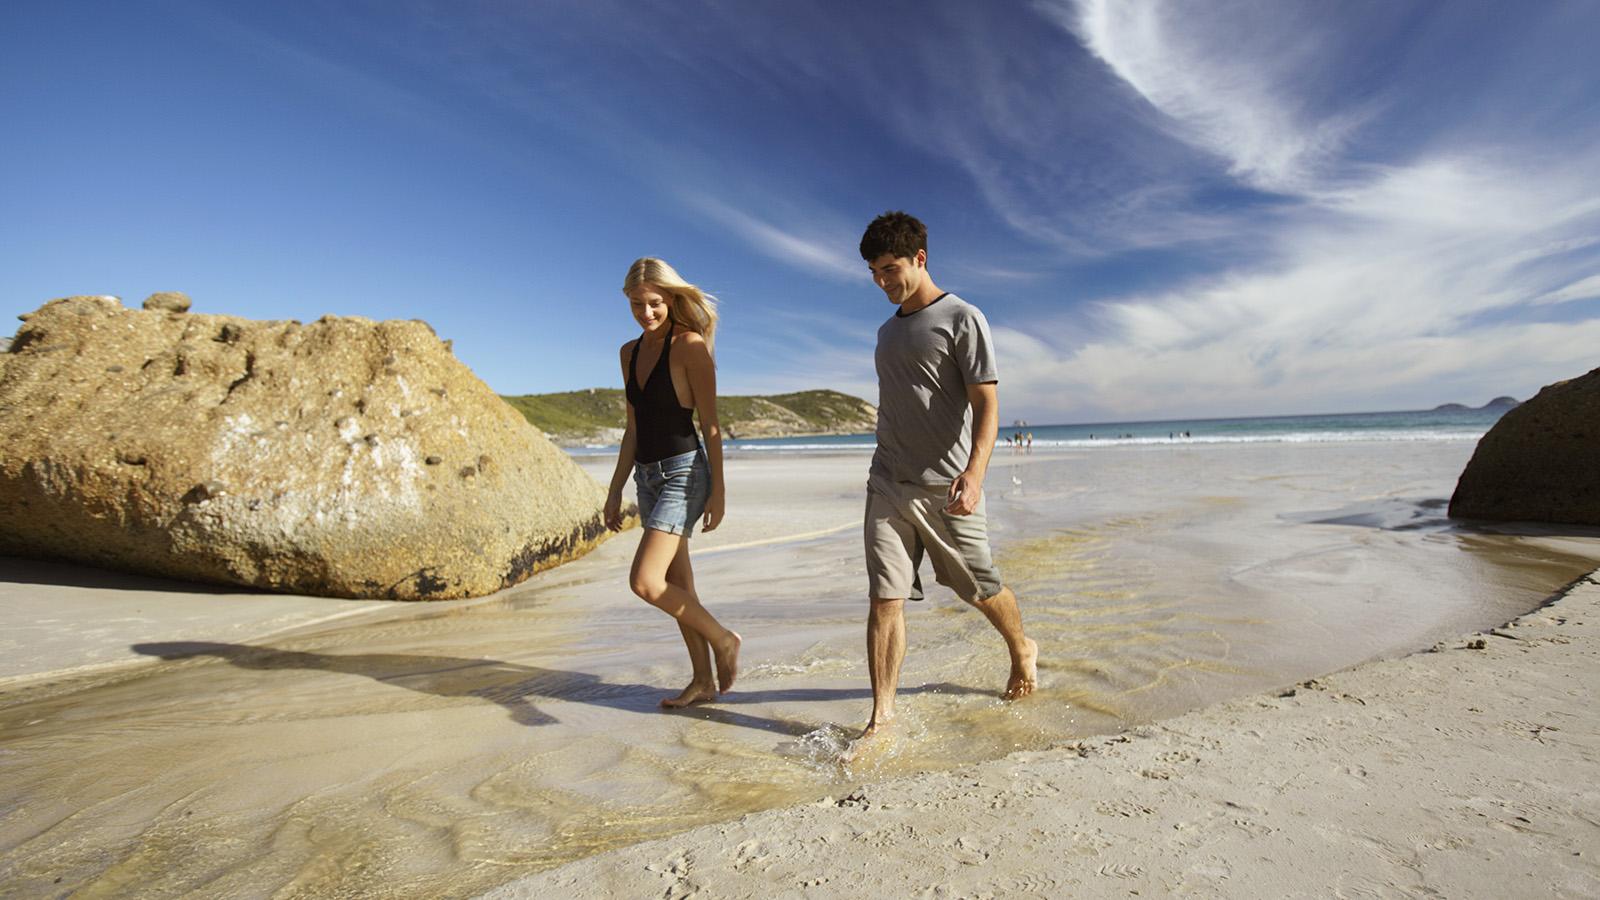 Squeaky Beach, Wilsons Promontory, Gippsland Victoria, Australia